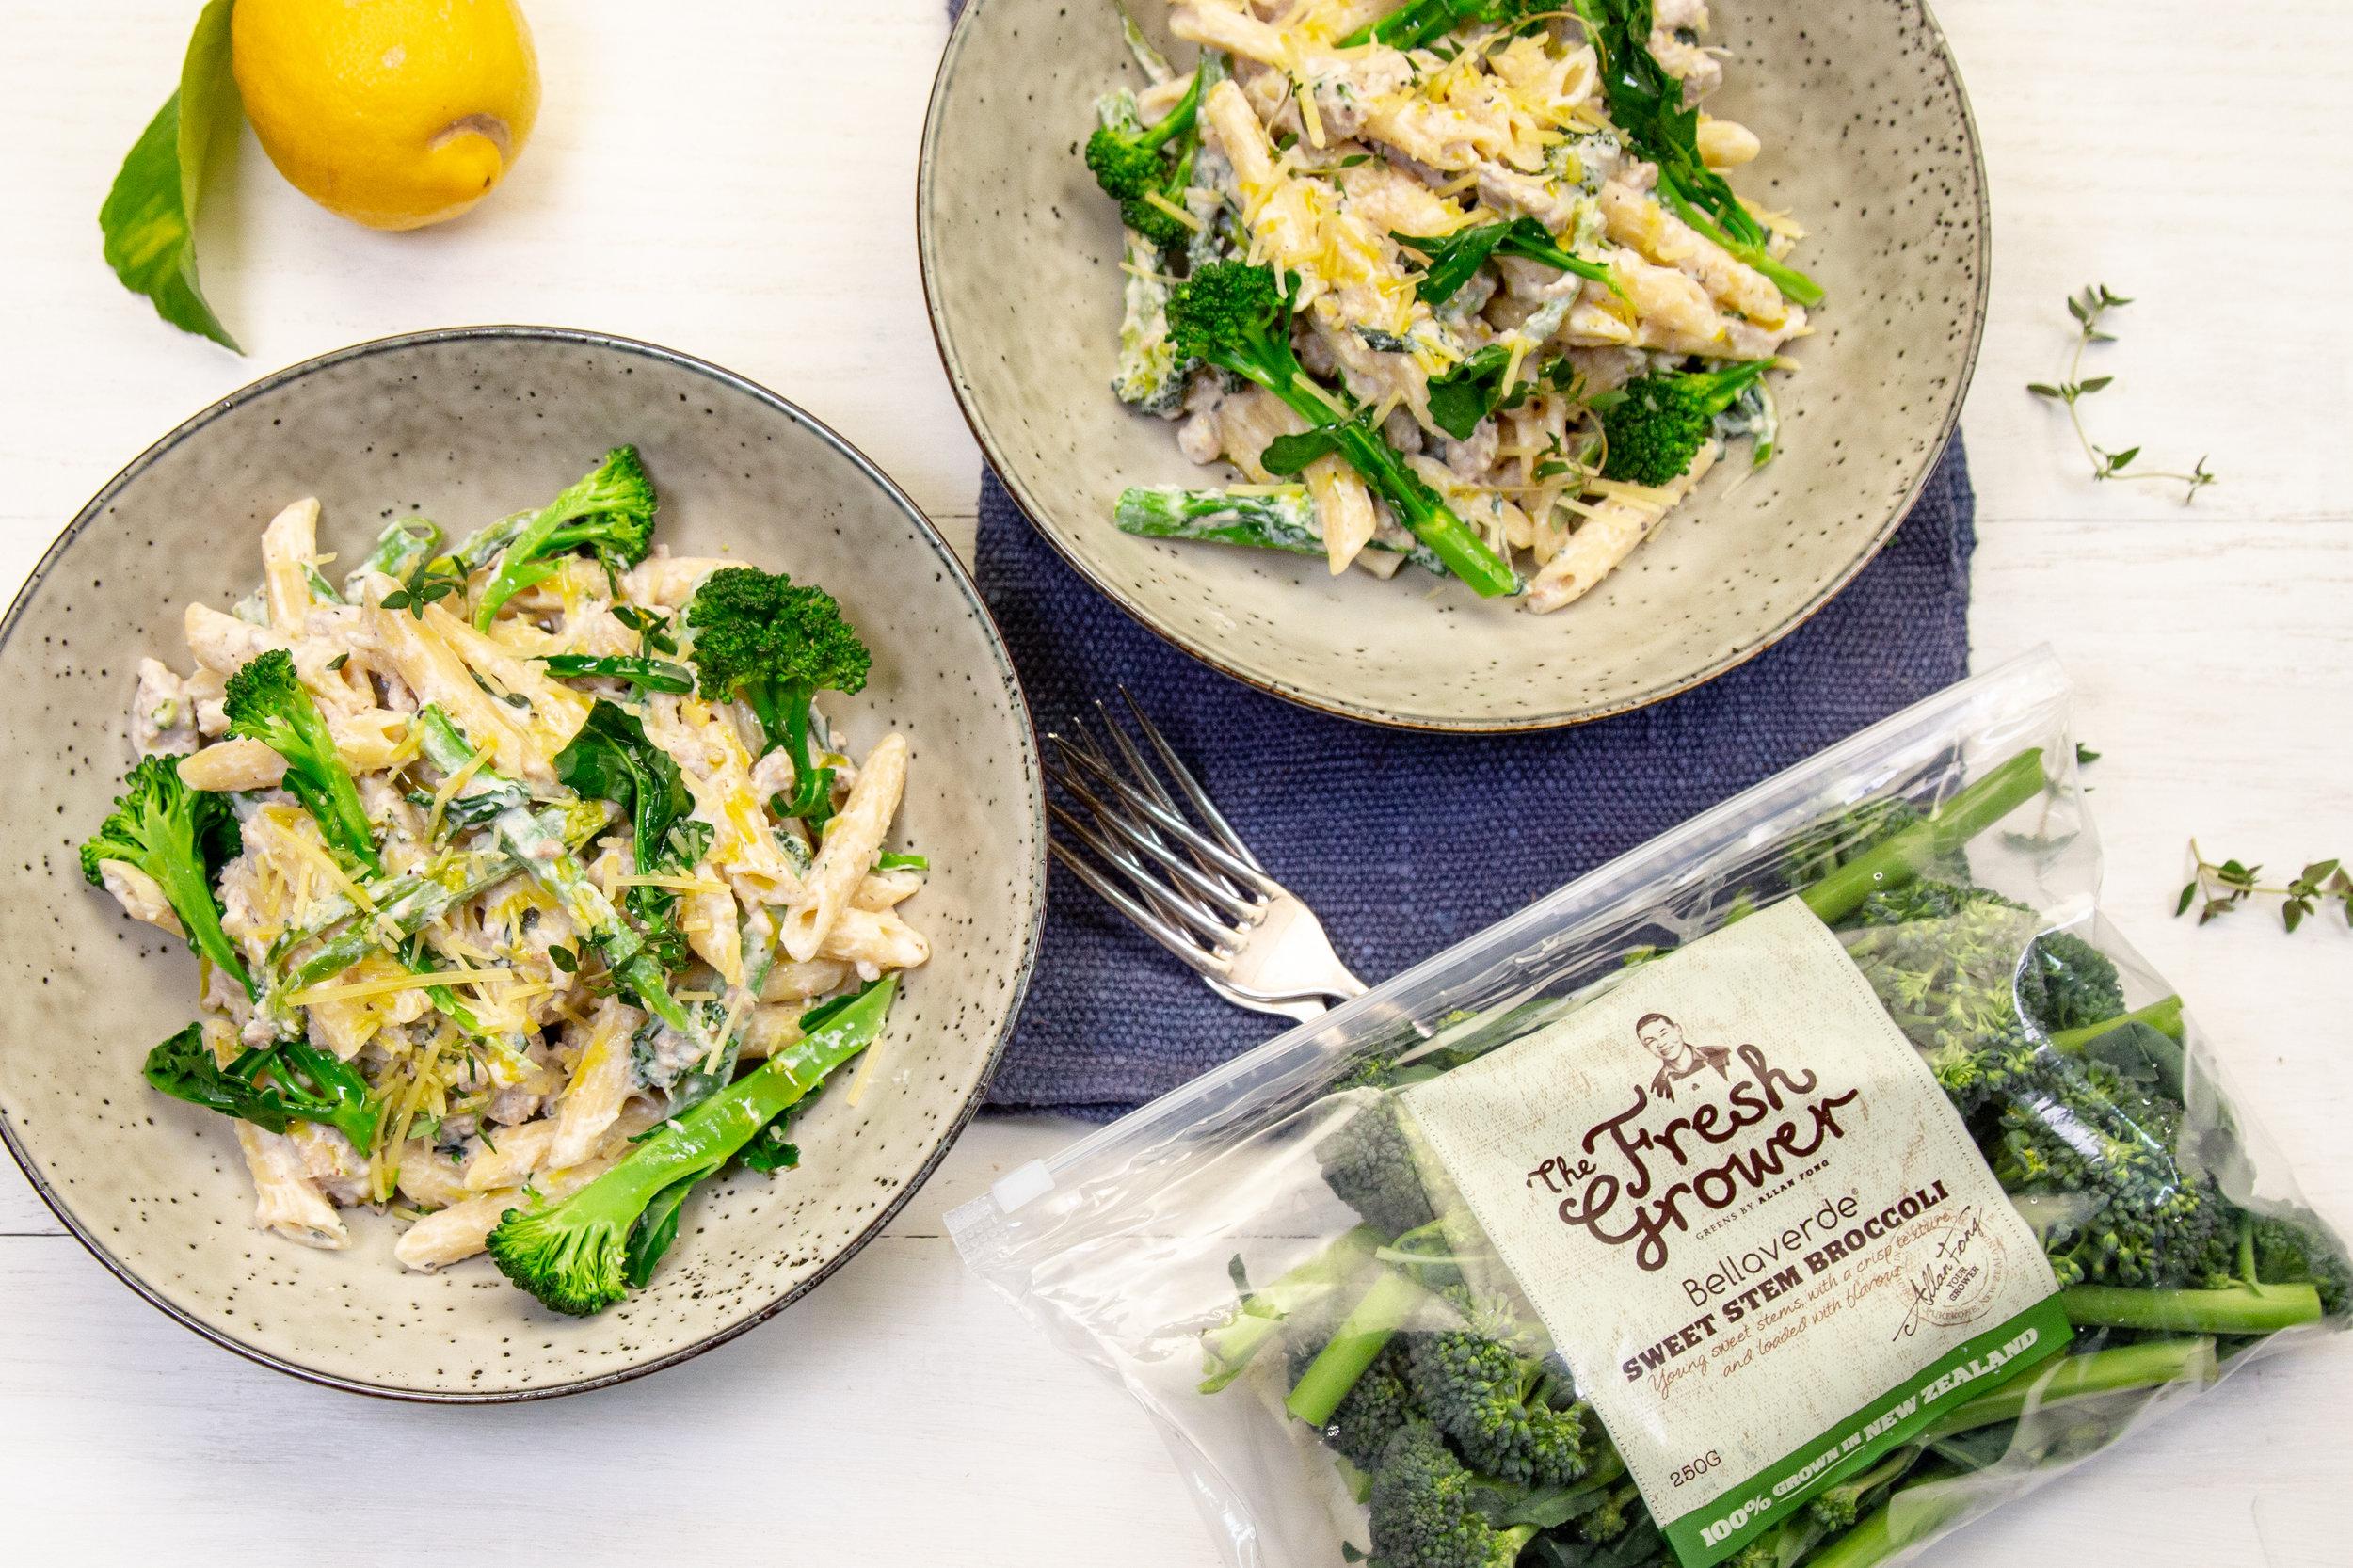 Penne with broccolini, pork sausage, lemon zest and ricotta